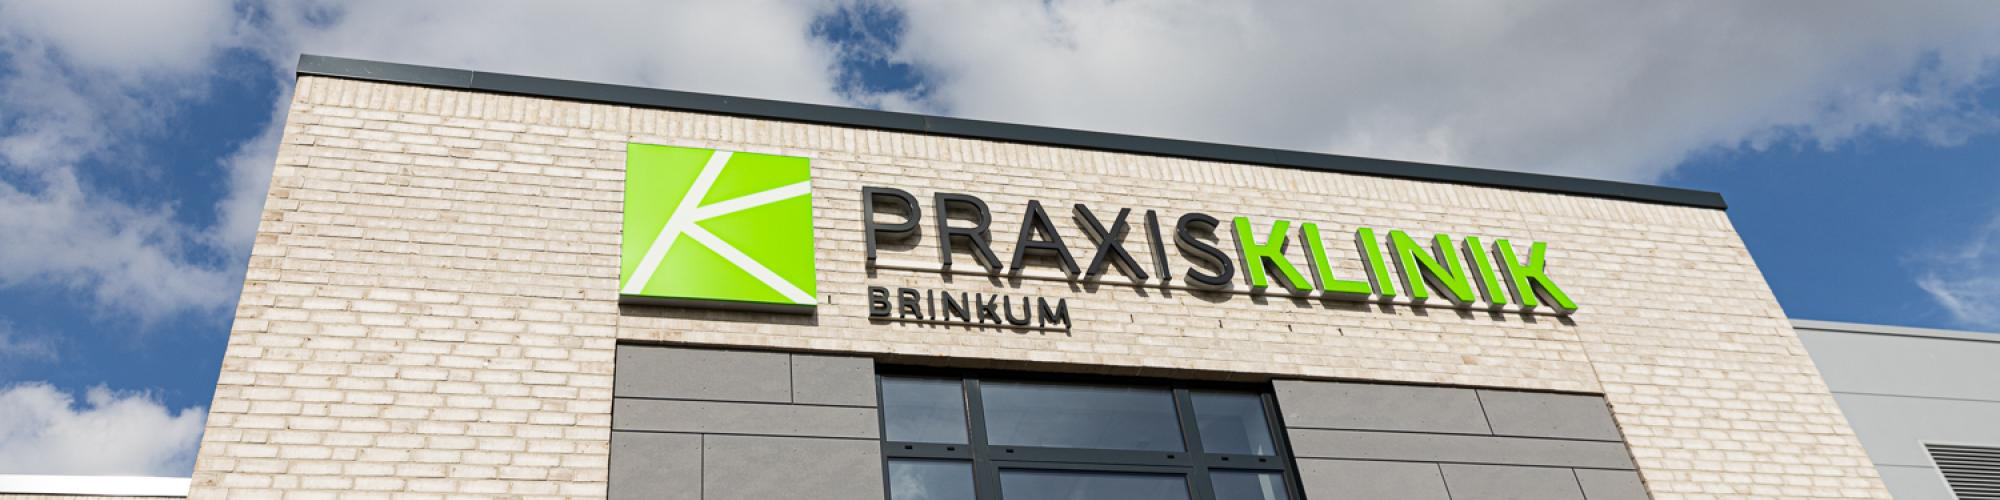 Praxisklinik Brinkum